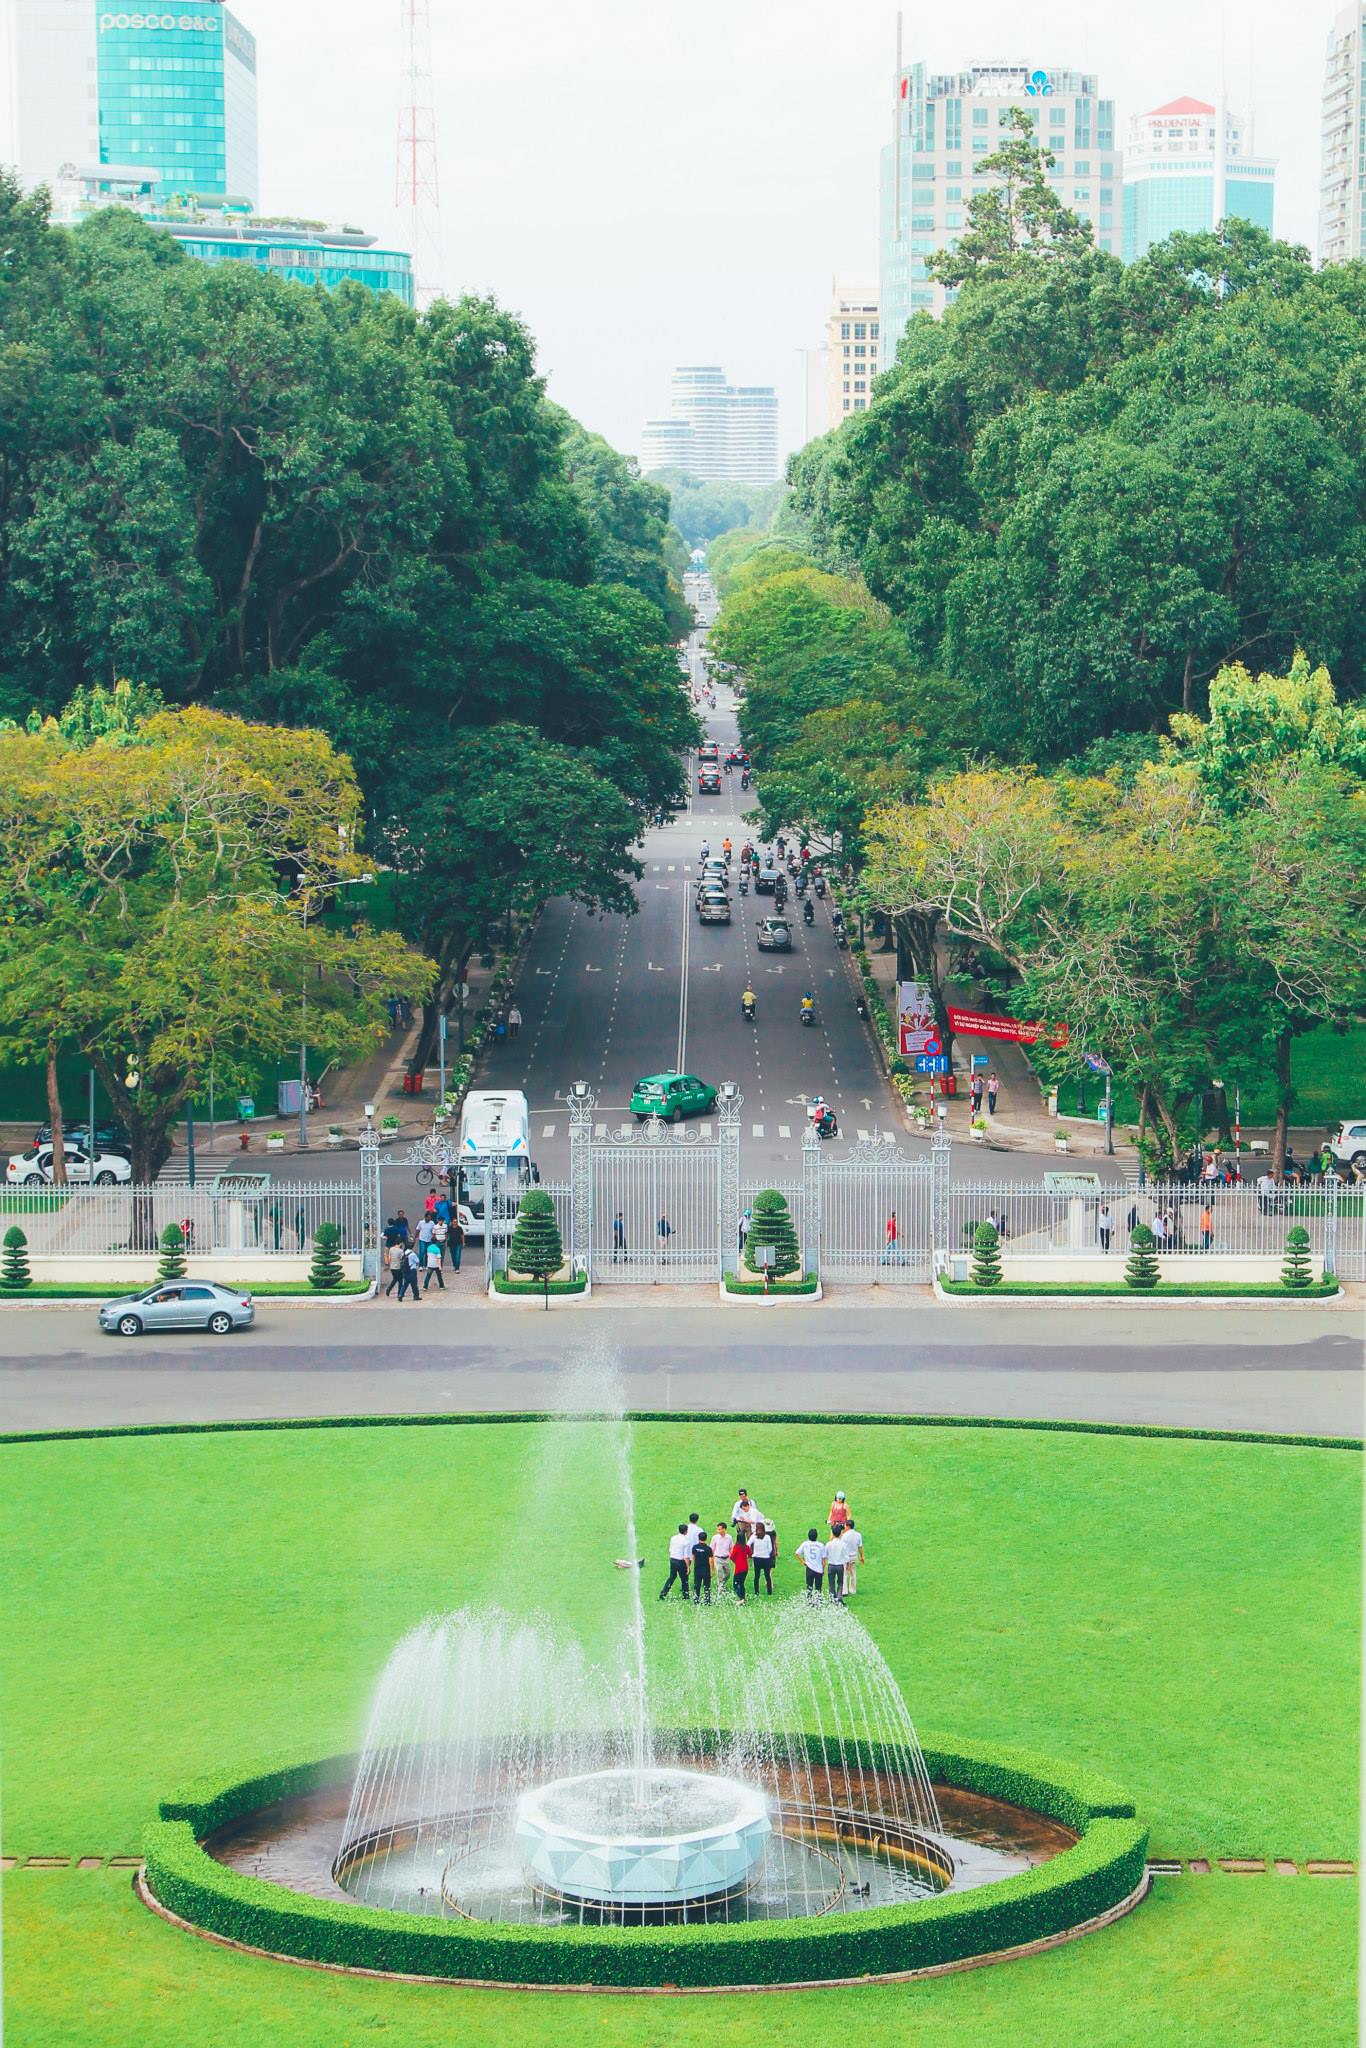 Photo Diary: Visiting Independence Palace in Saigon, Vietnam (16)